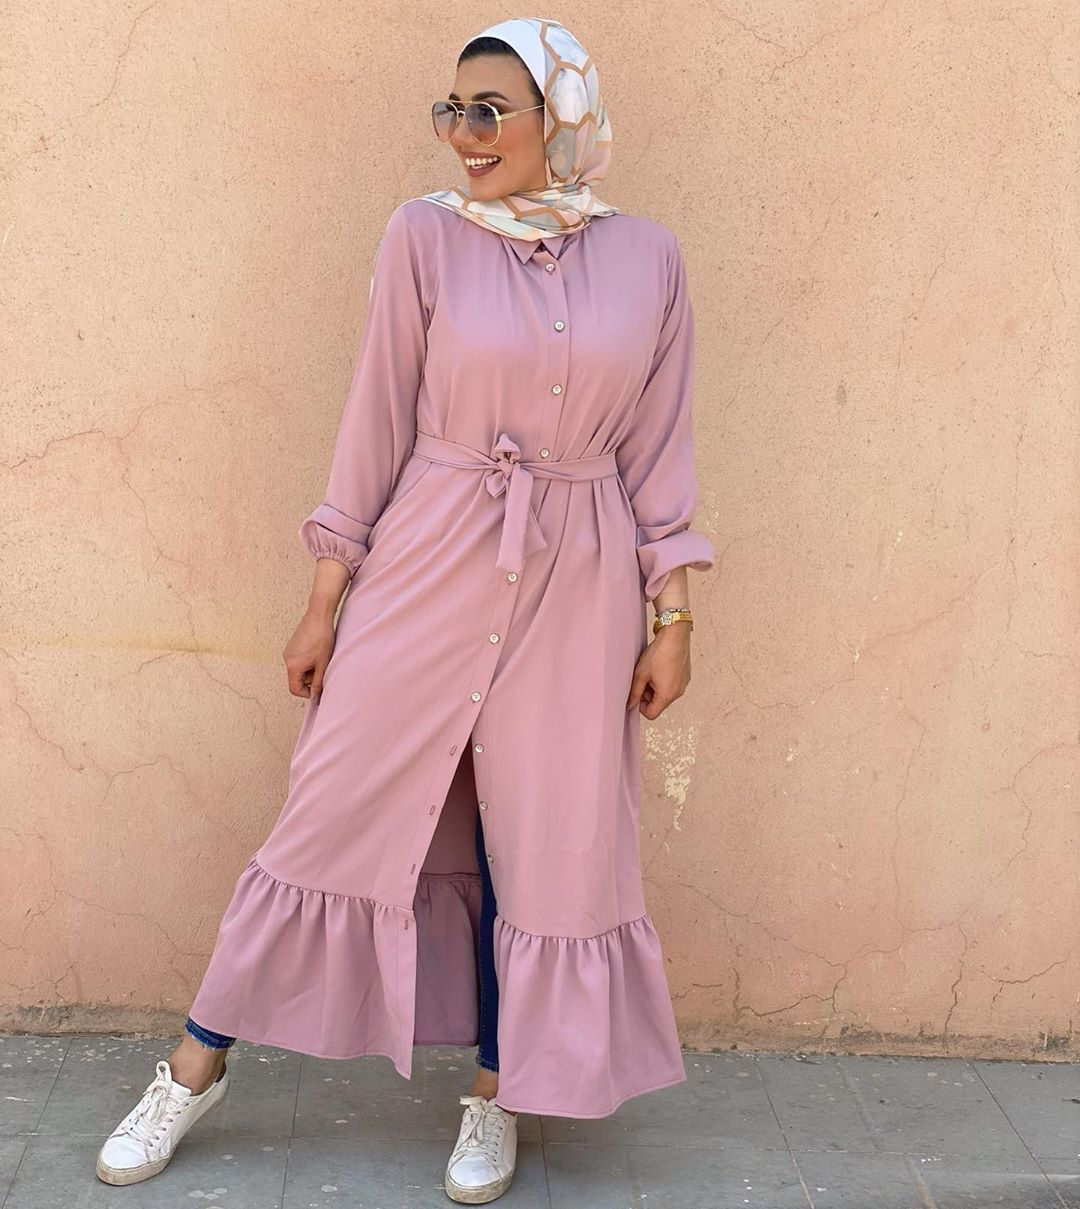 W O M A N I S T A On Instagram That Color Pink Material Rozalin Size M L Xl For Orders Fashion Coat Duster Coat